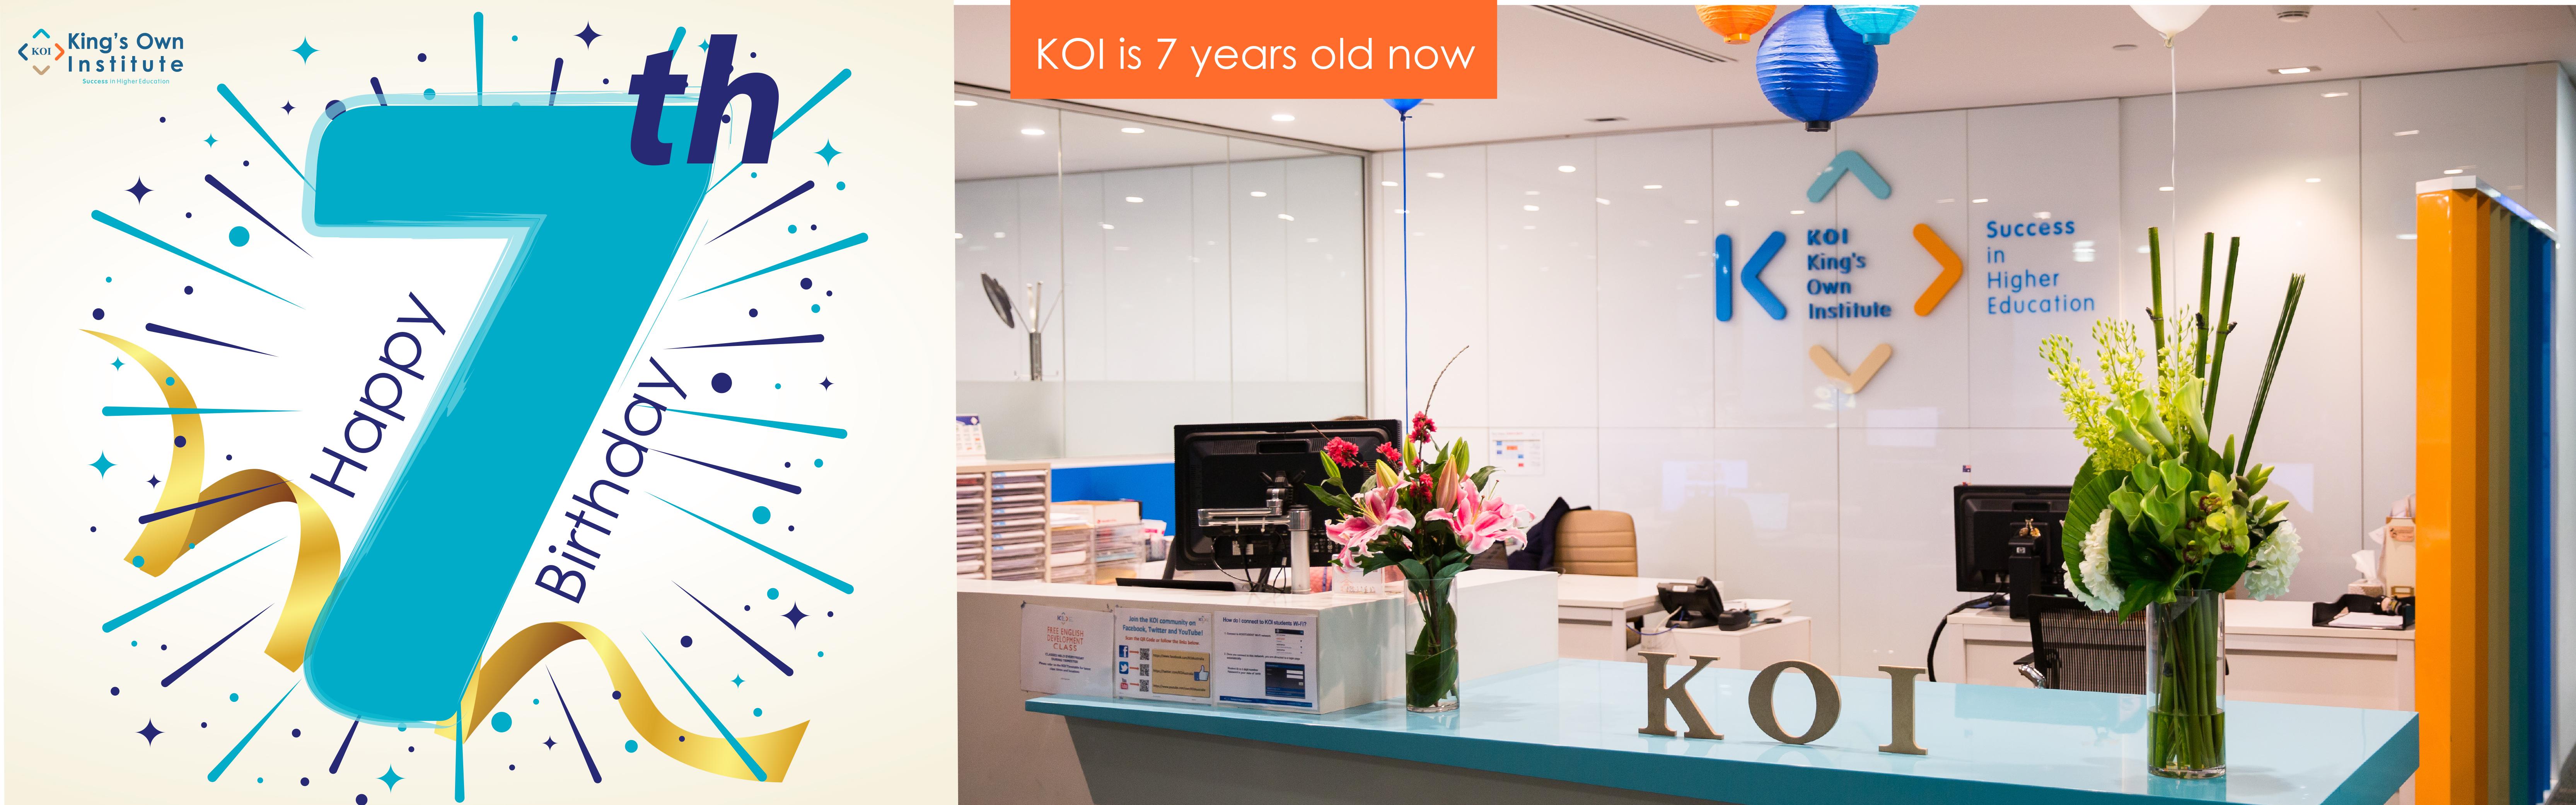 KOI-Homepage